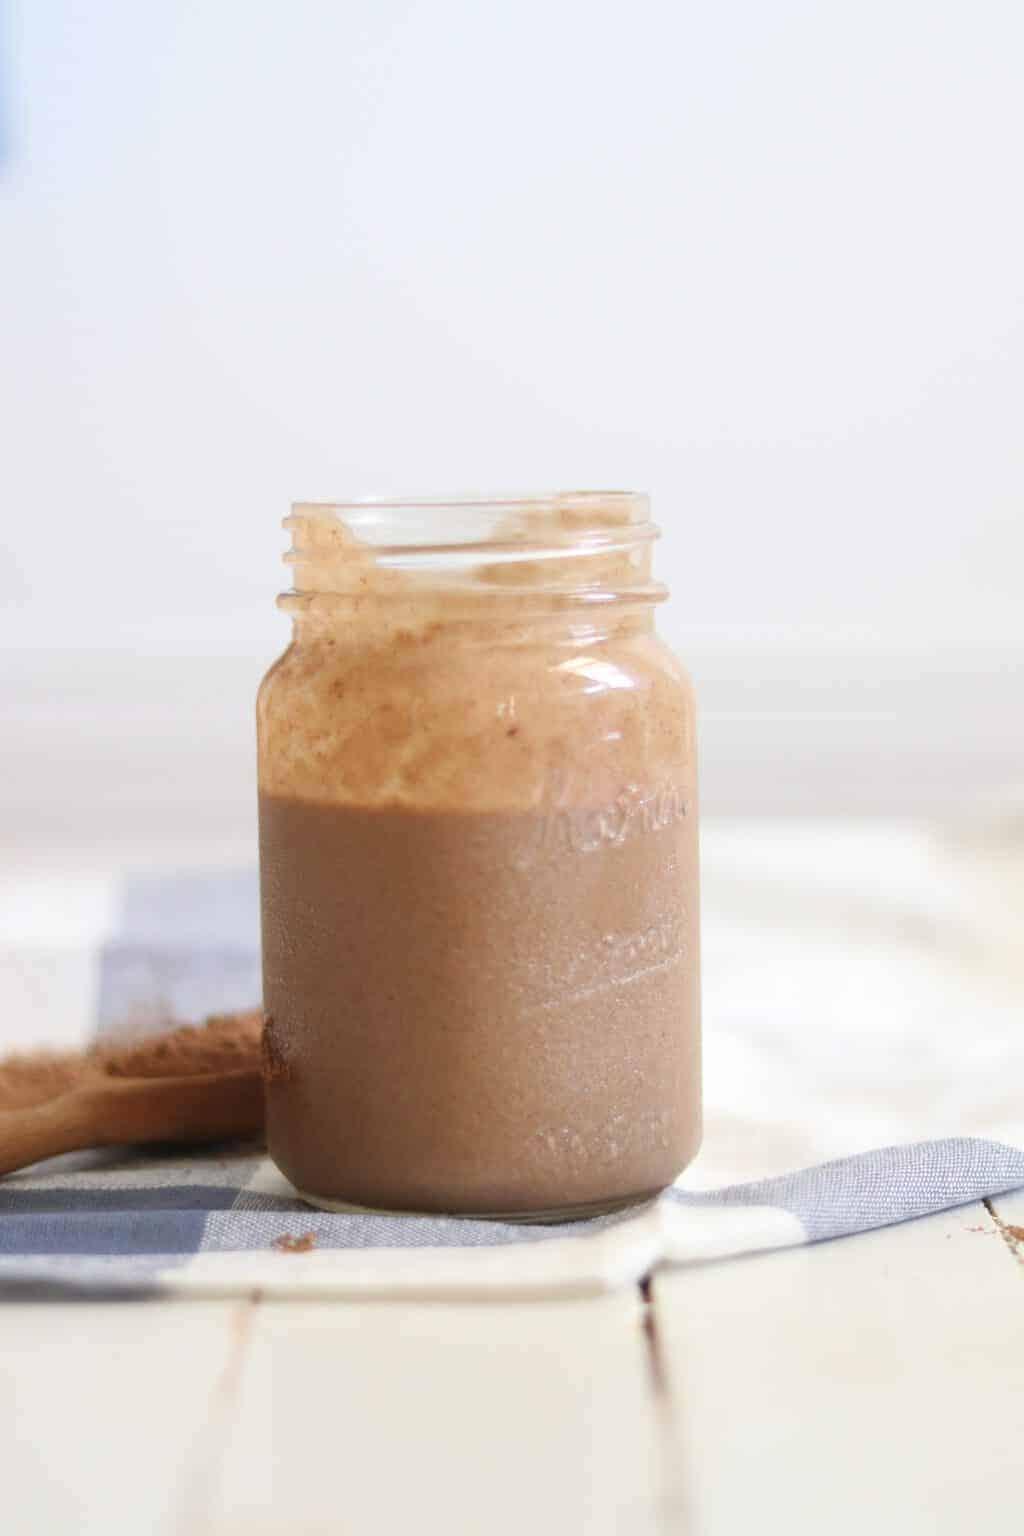 Healthy peanut butter chocolate ice cream in quart size mason jar on white shiplap.